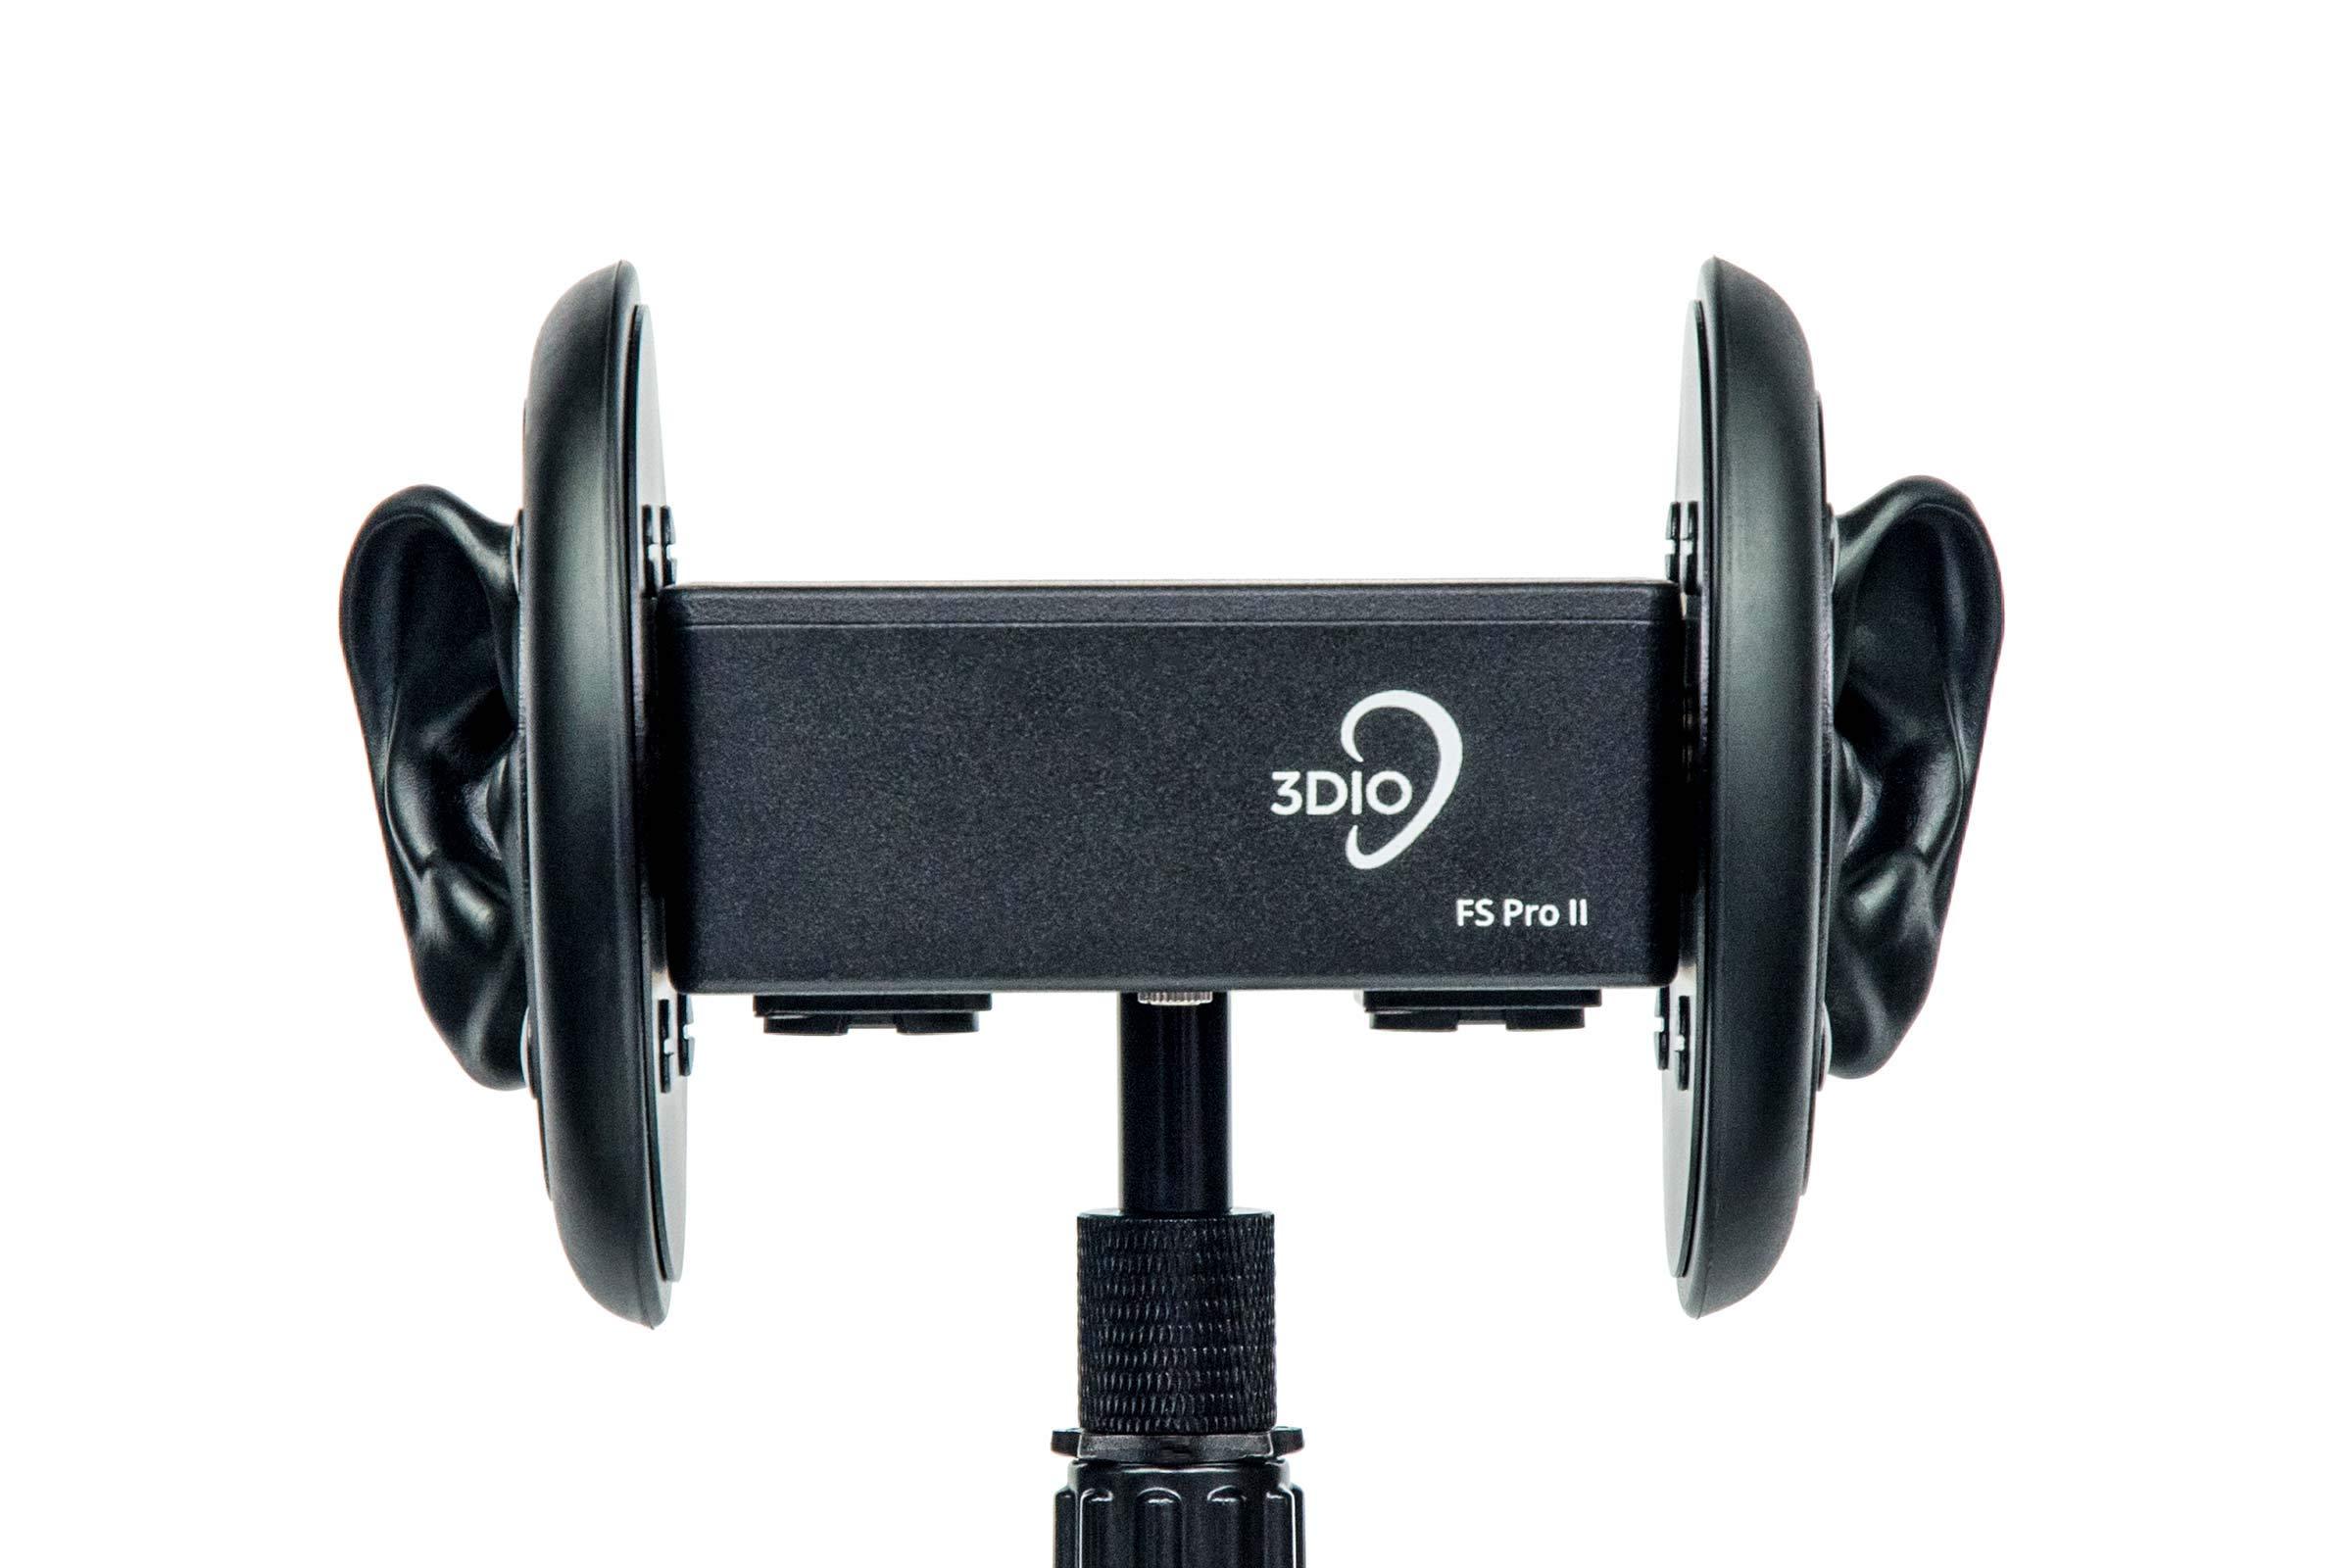 3Dio FS Pro II (FSP2-2B-003)